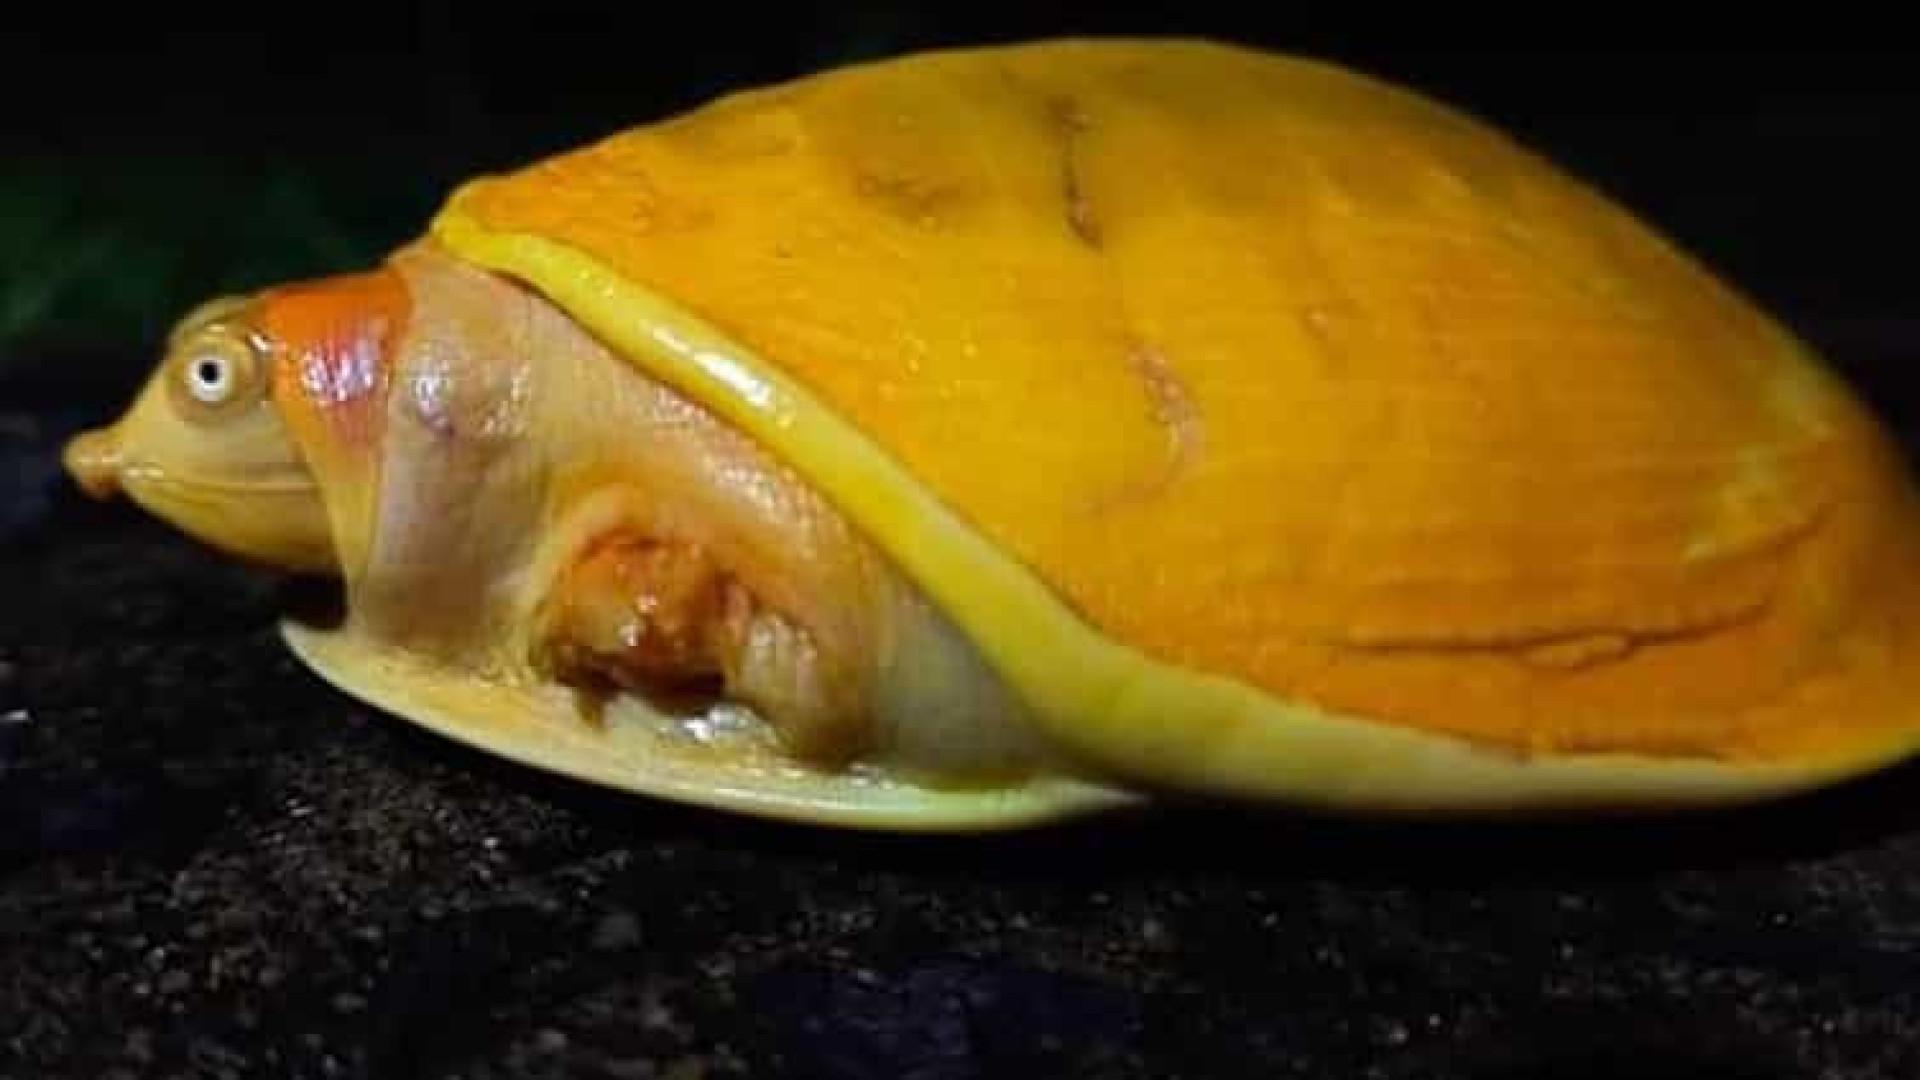 Descoberta rara tartaruga amarela na Índia